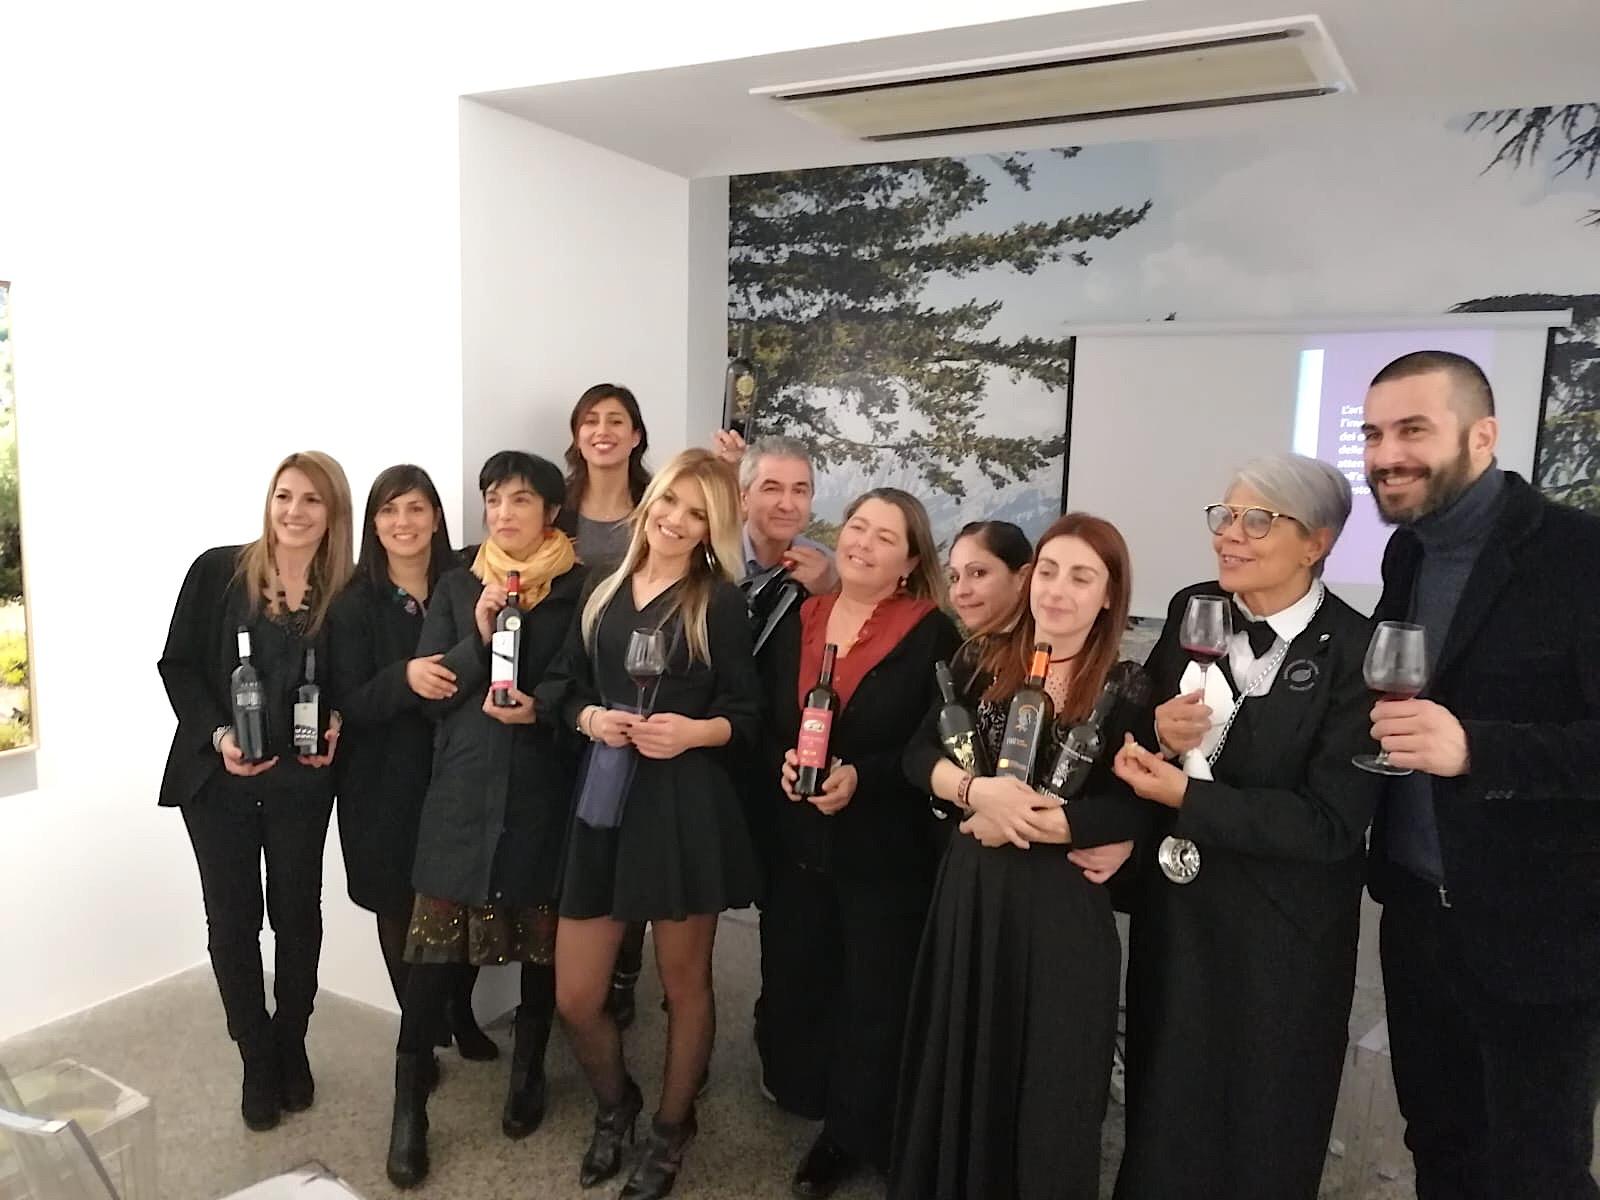 Sardegna. Festa Donne Vino design, Cantina Audarya, 2 marzo 2019